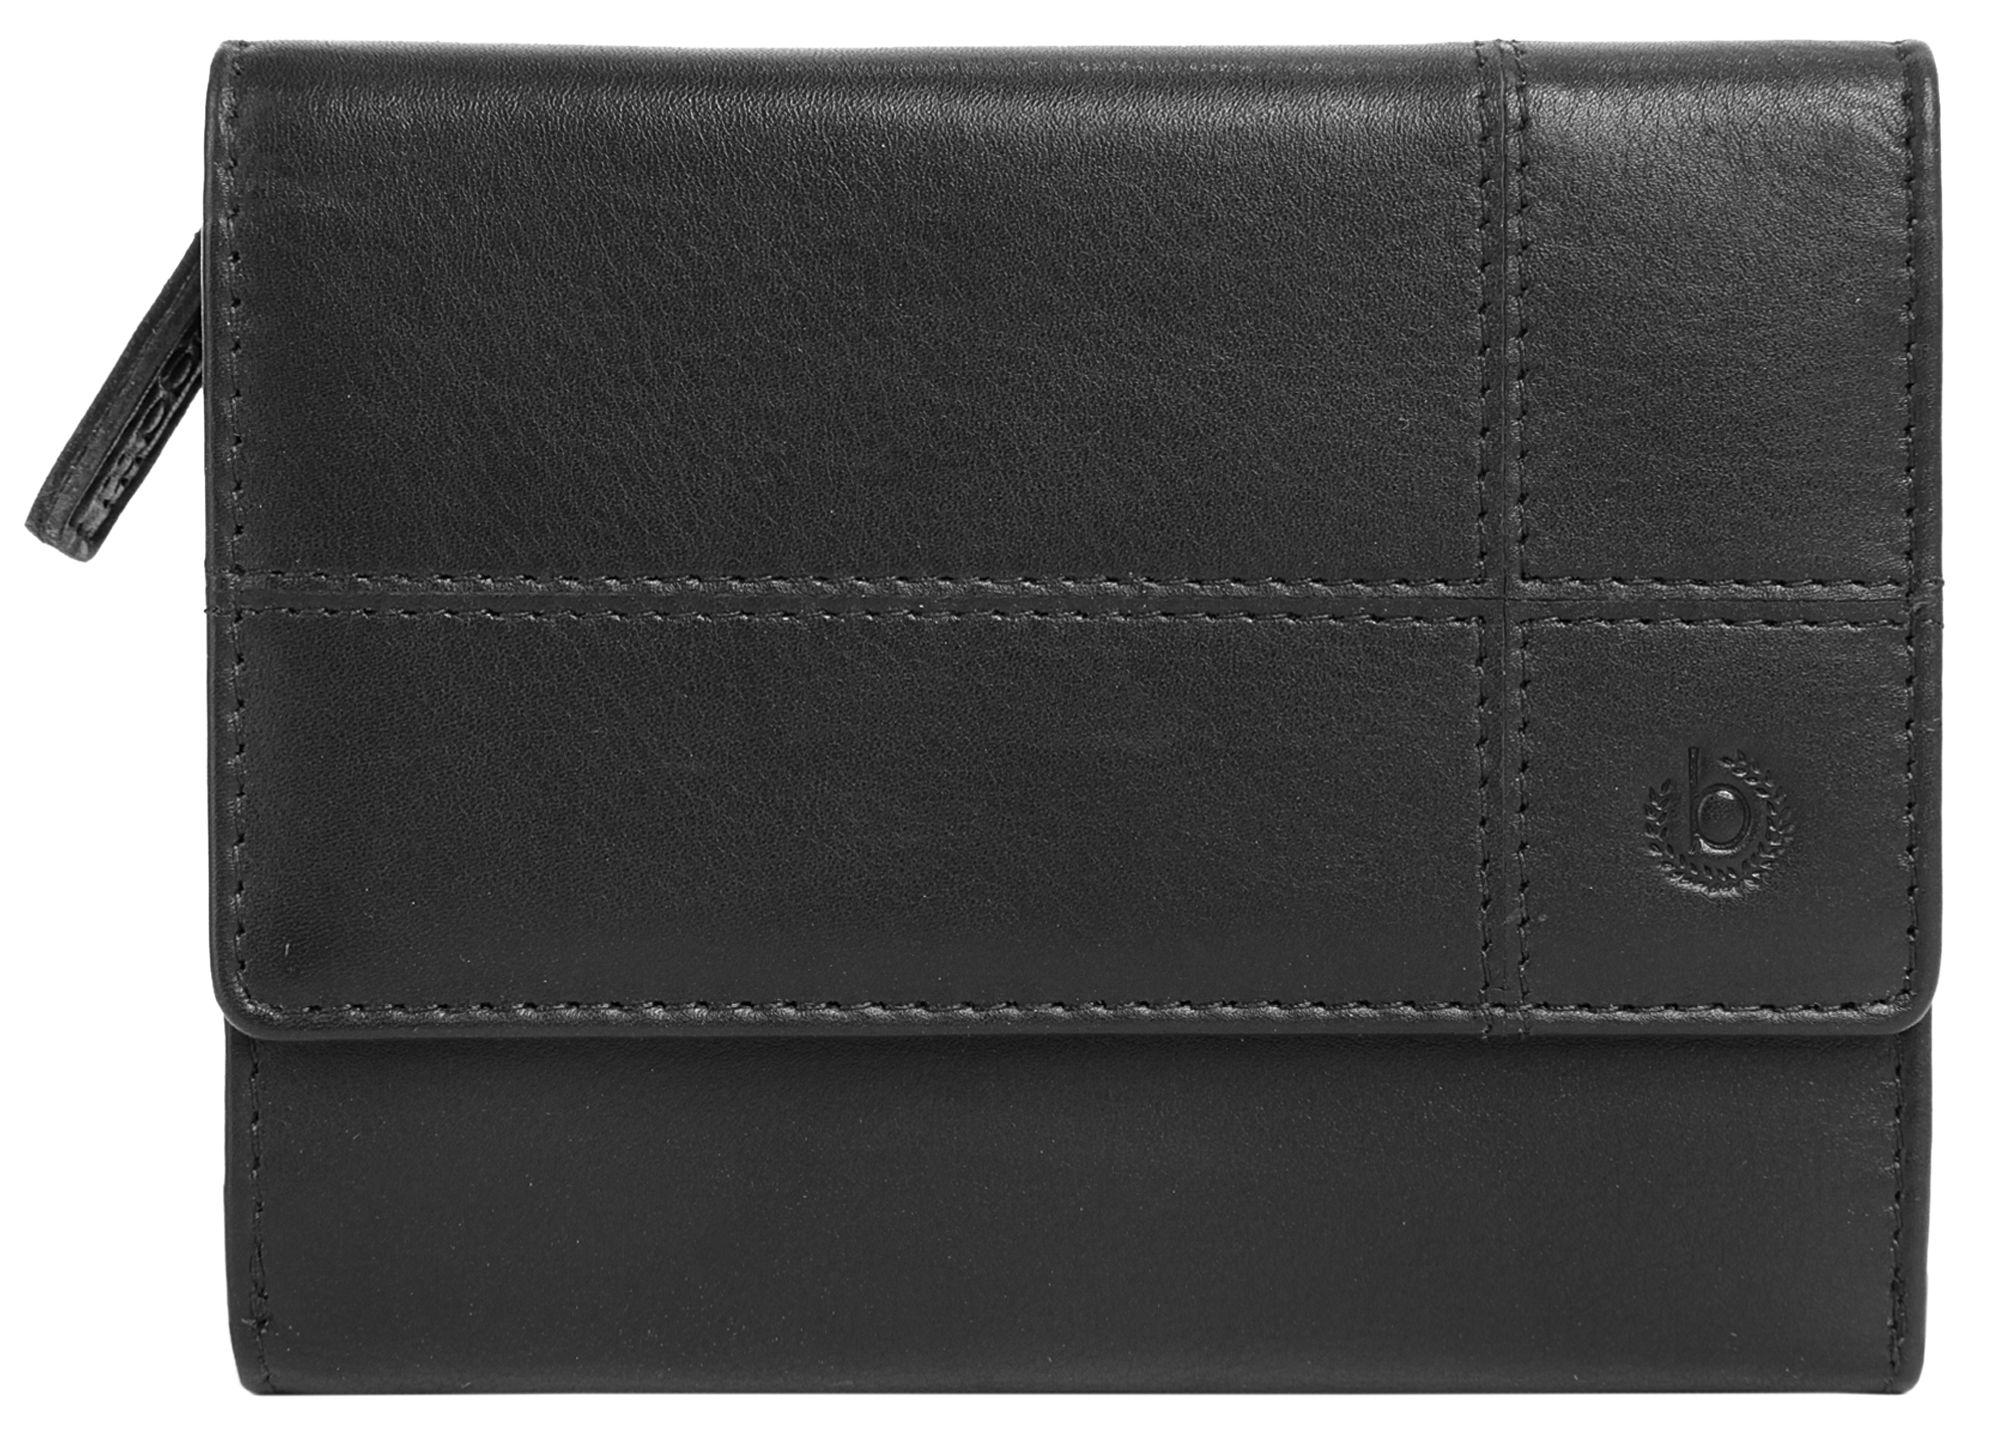 BUGATTI Bradford Geldbörse Leder 12 cm Bugatti schwarz